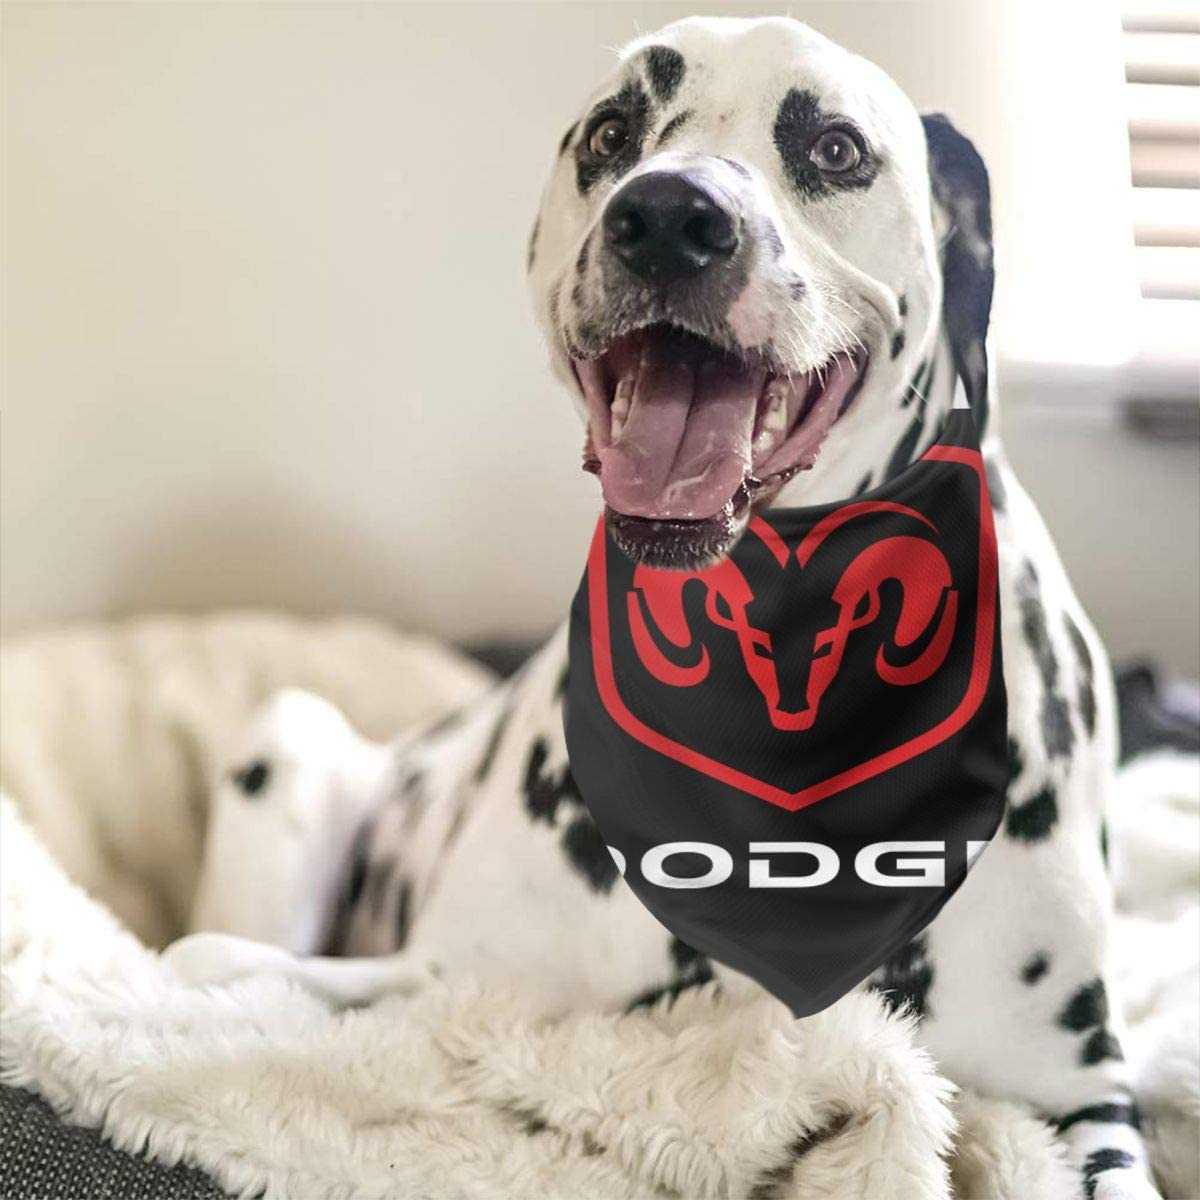 C-JOY Dodge Ram Hemi Dog Bandana Collars Triangle Neckerchief Bibs Scarfs Pet Cats and Baby Puppies Saliva Towel